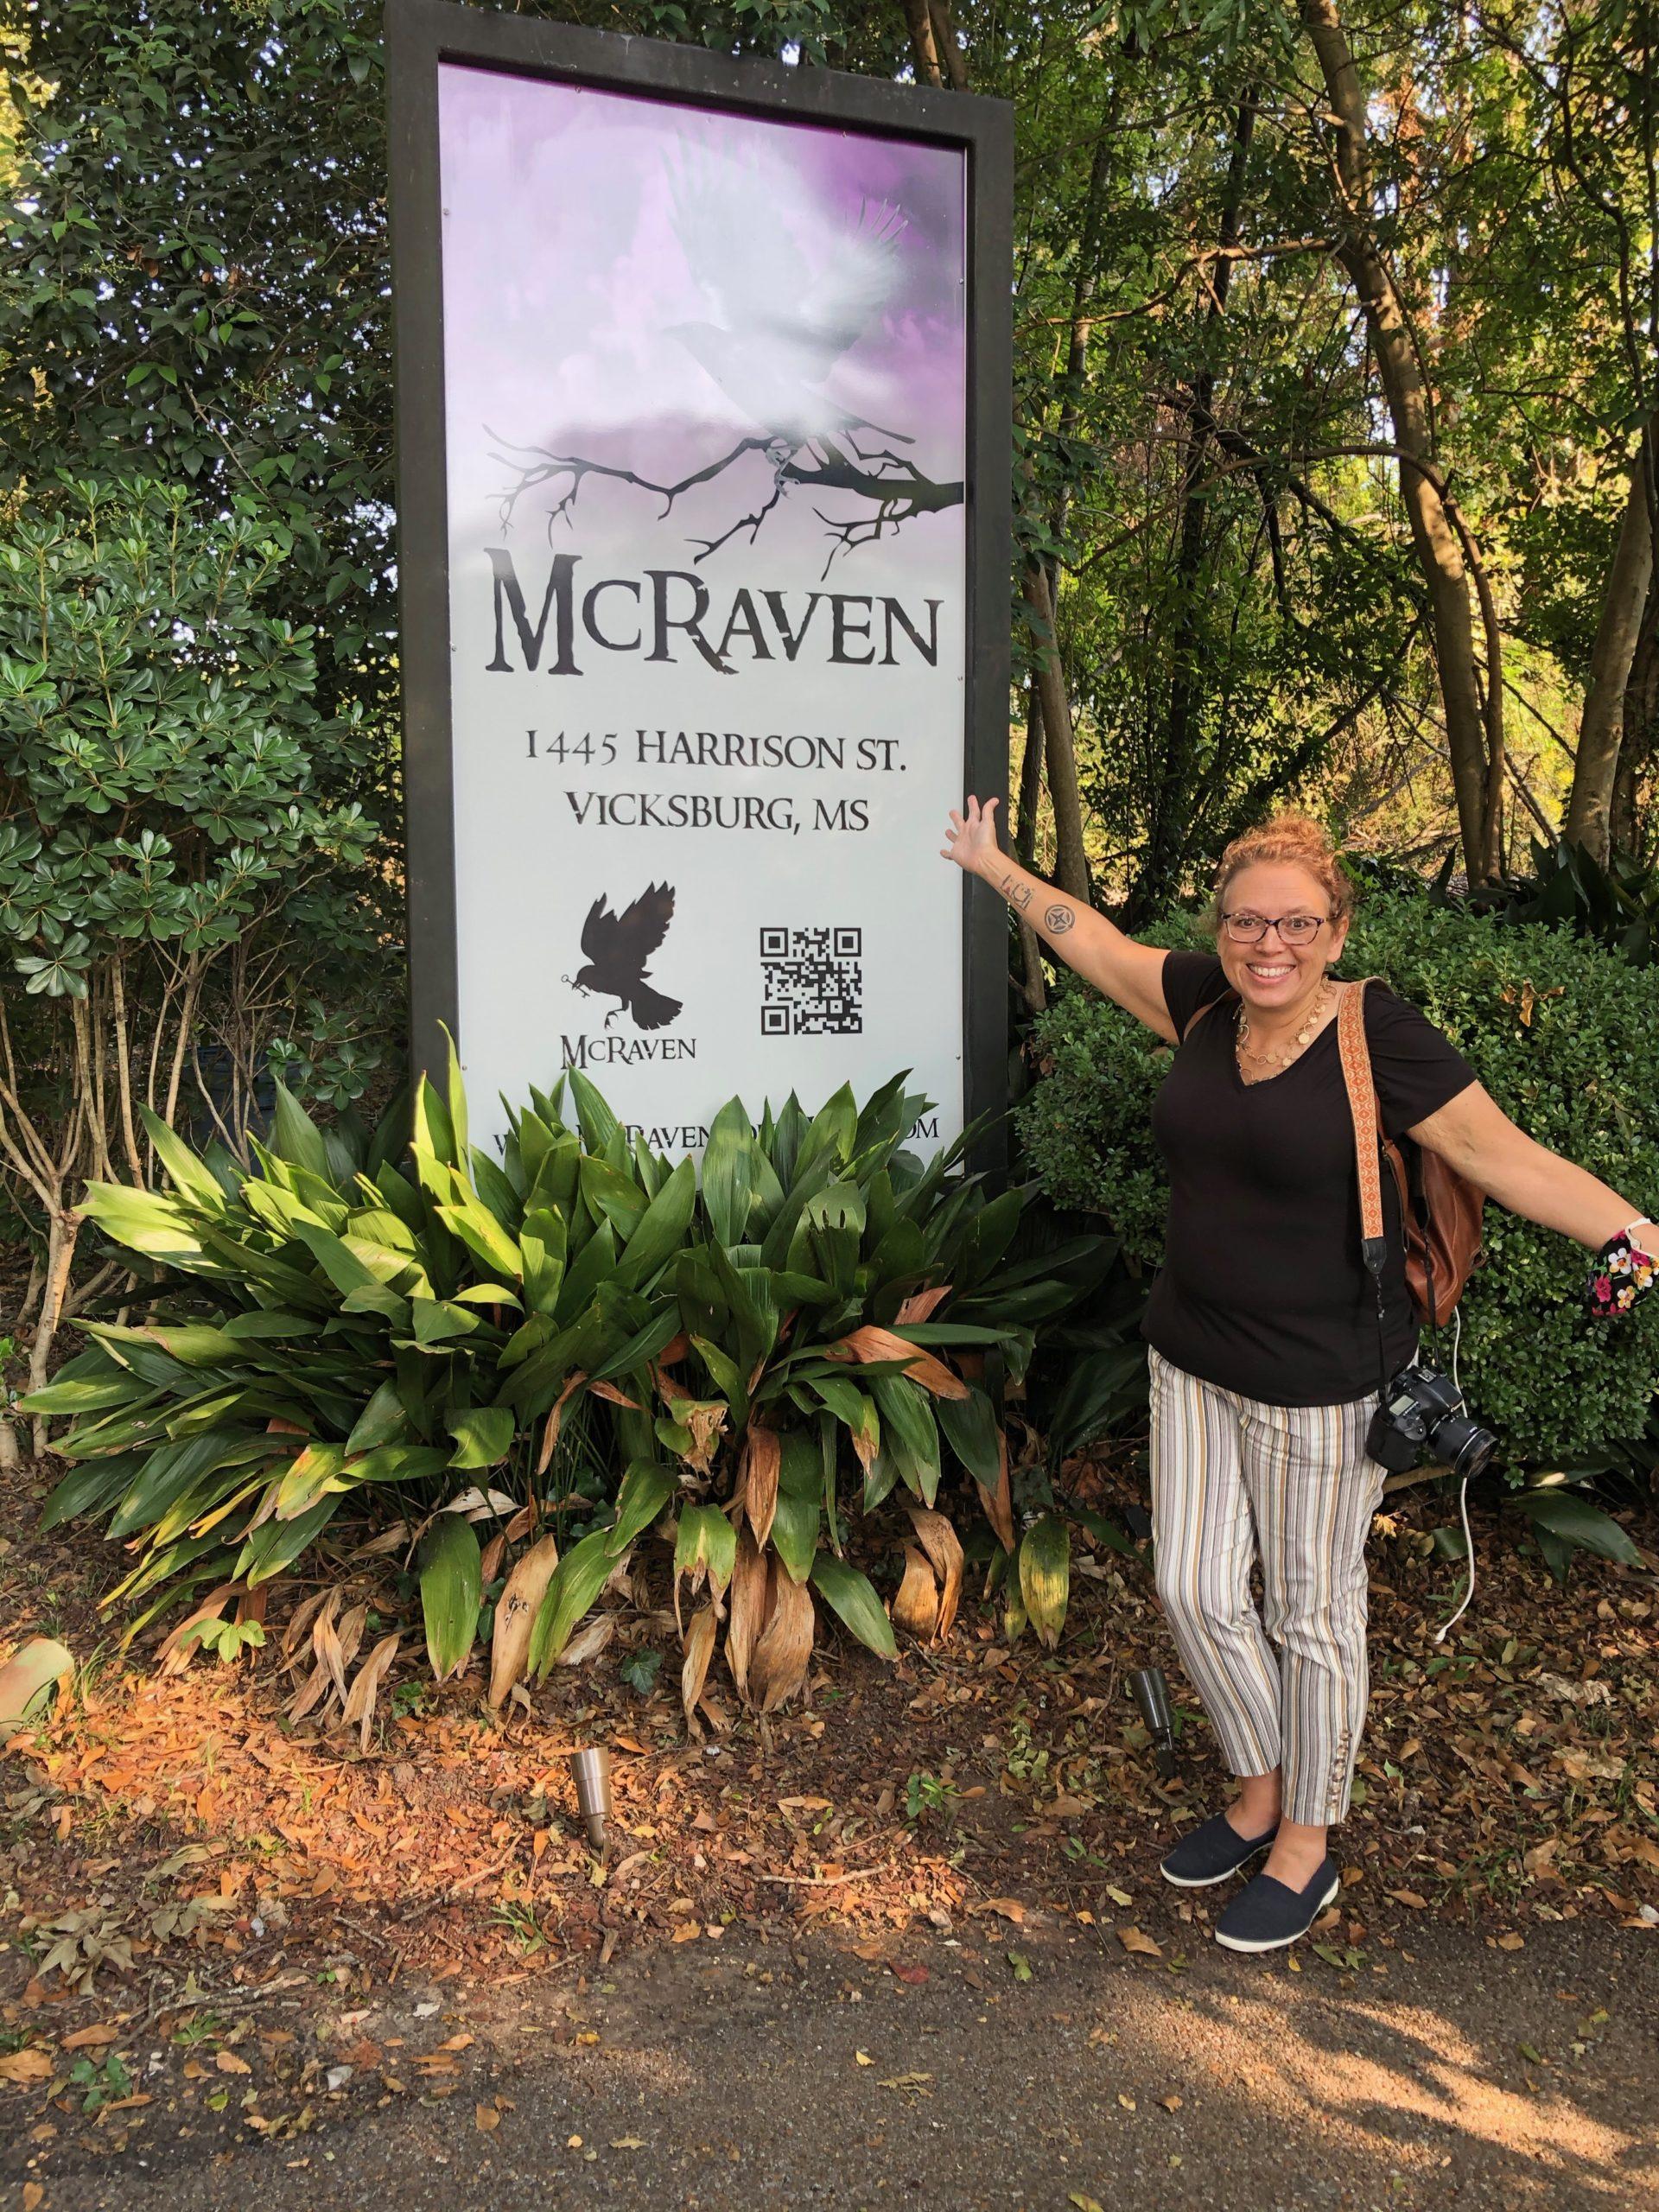 Tours of McRaven Home in Vicksburg MS